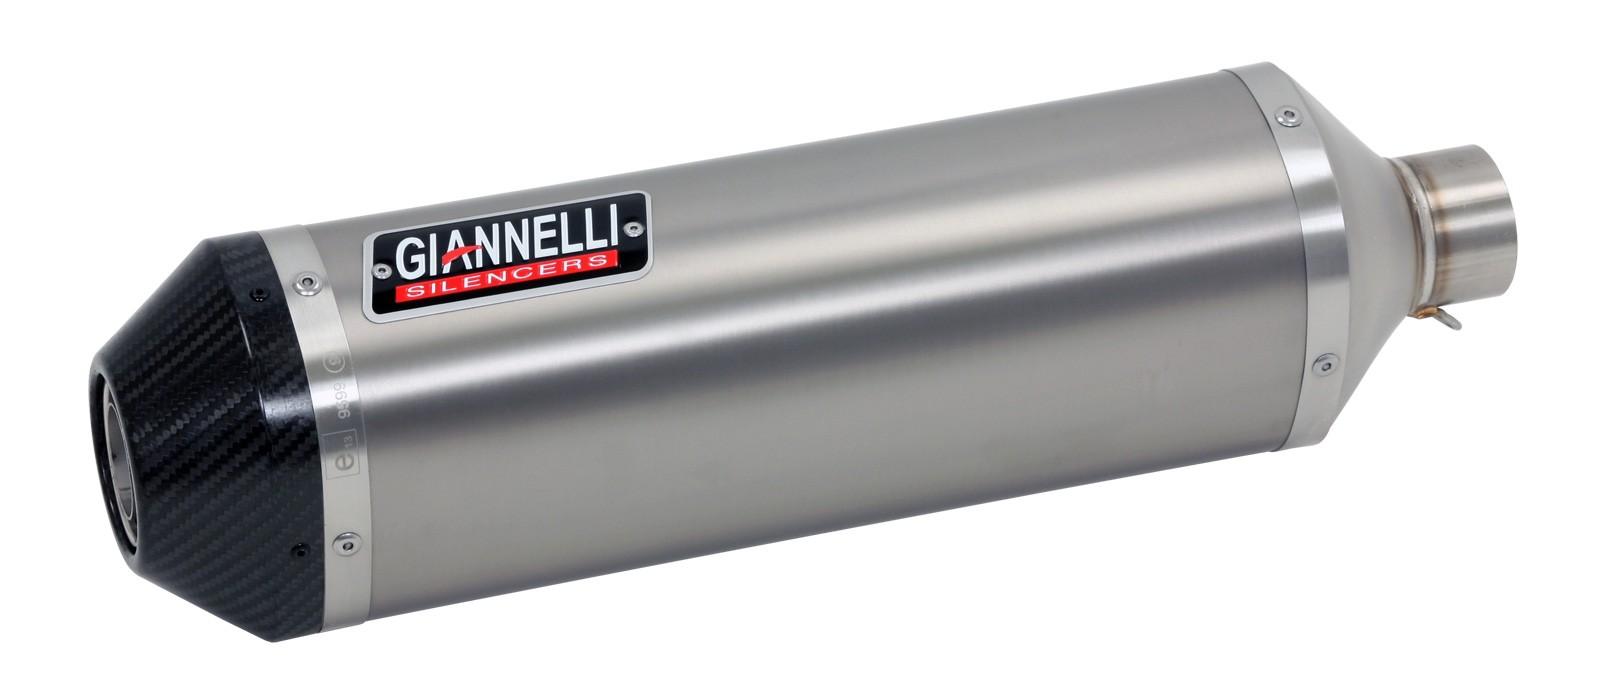 ESCAPES GIANNELLI KAWASAKI - Sistema completo IPERSPORT Silenciador aluminio versión Black Line Kawasaki NINJA 250/300